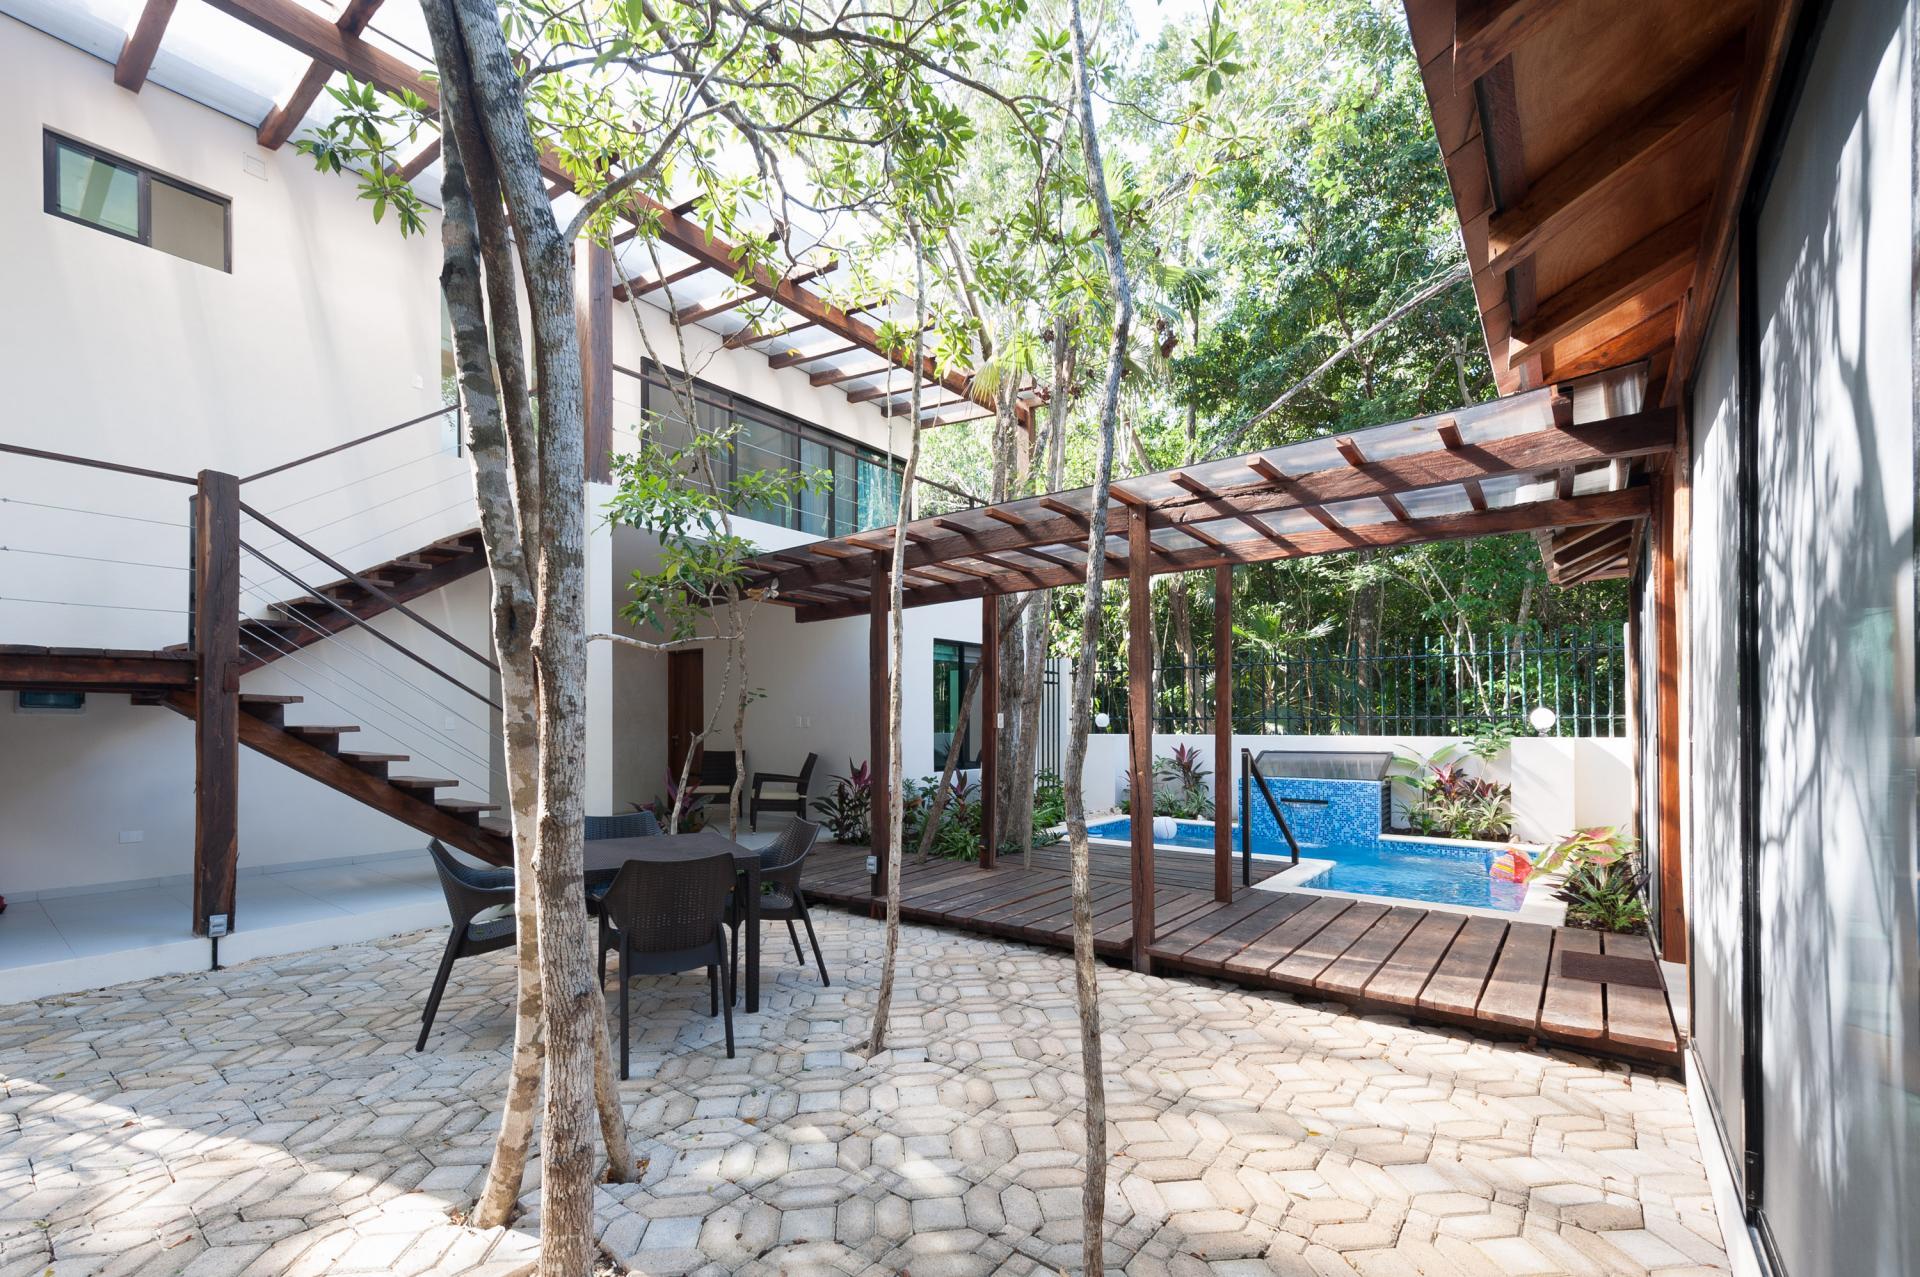 Private outdoor area